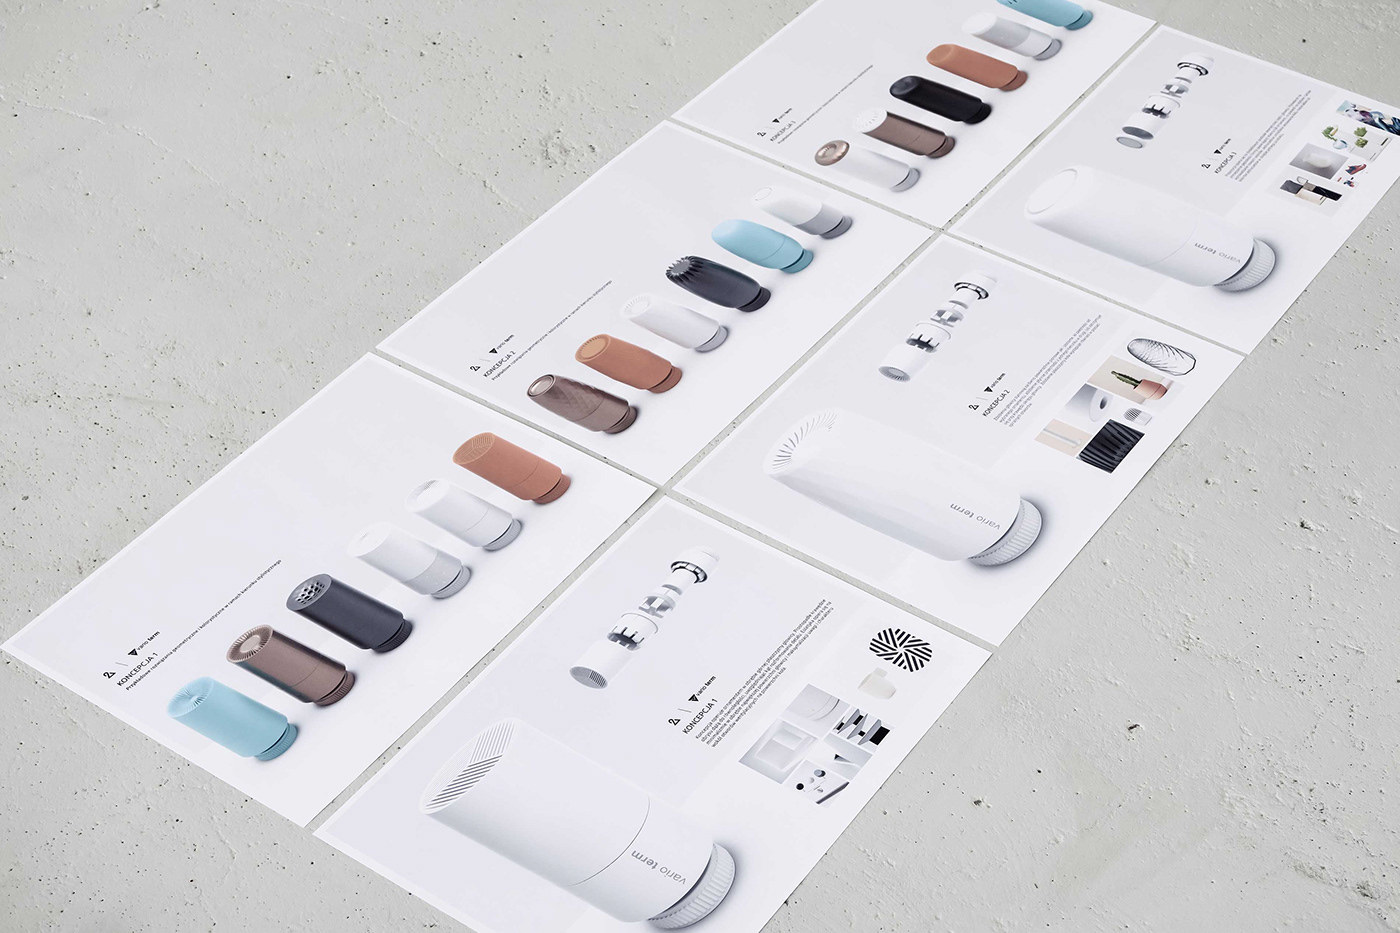 2sympleks appliances design home thermostat